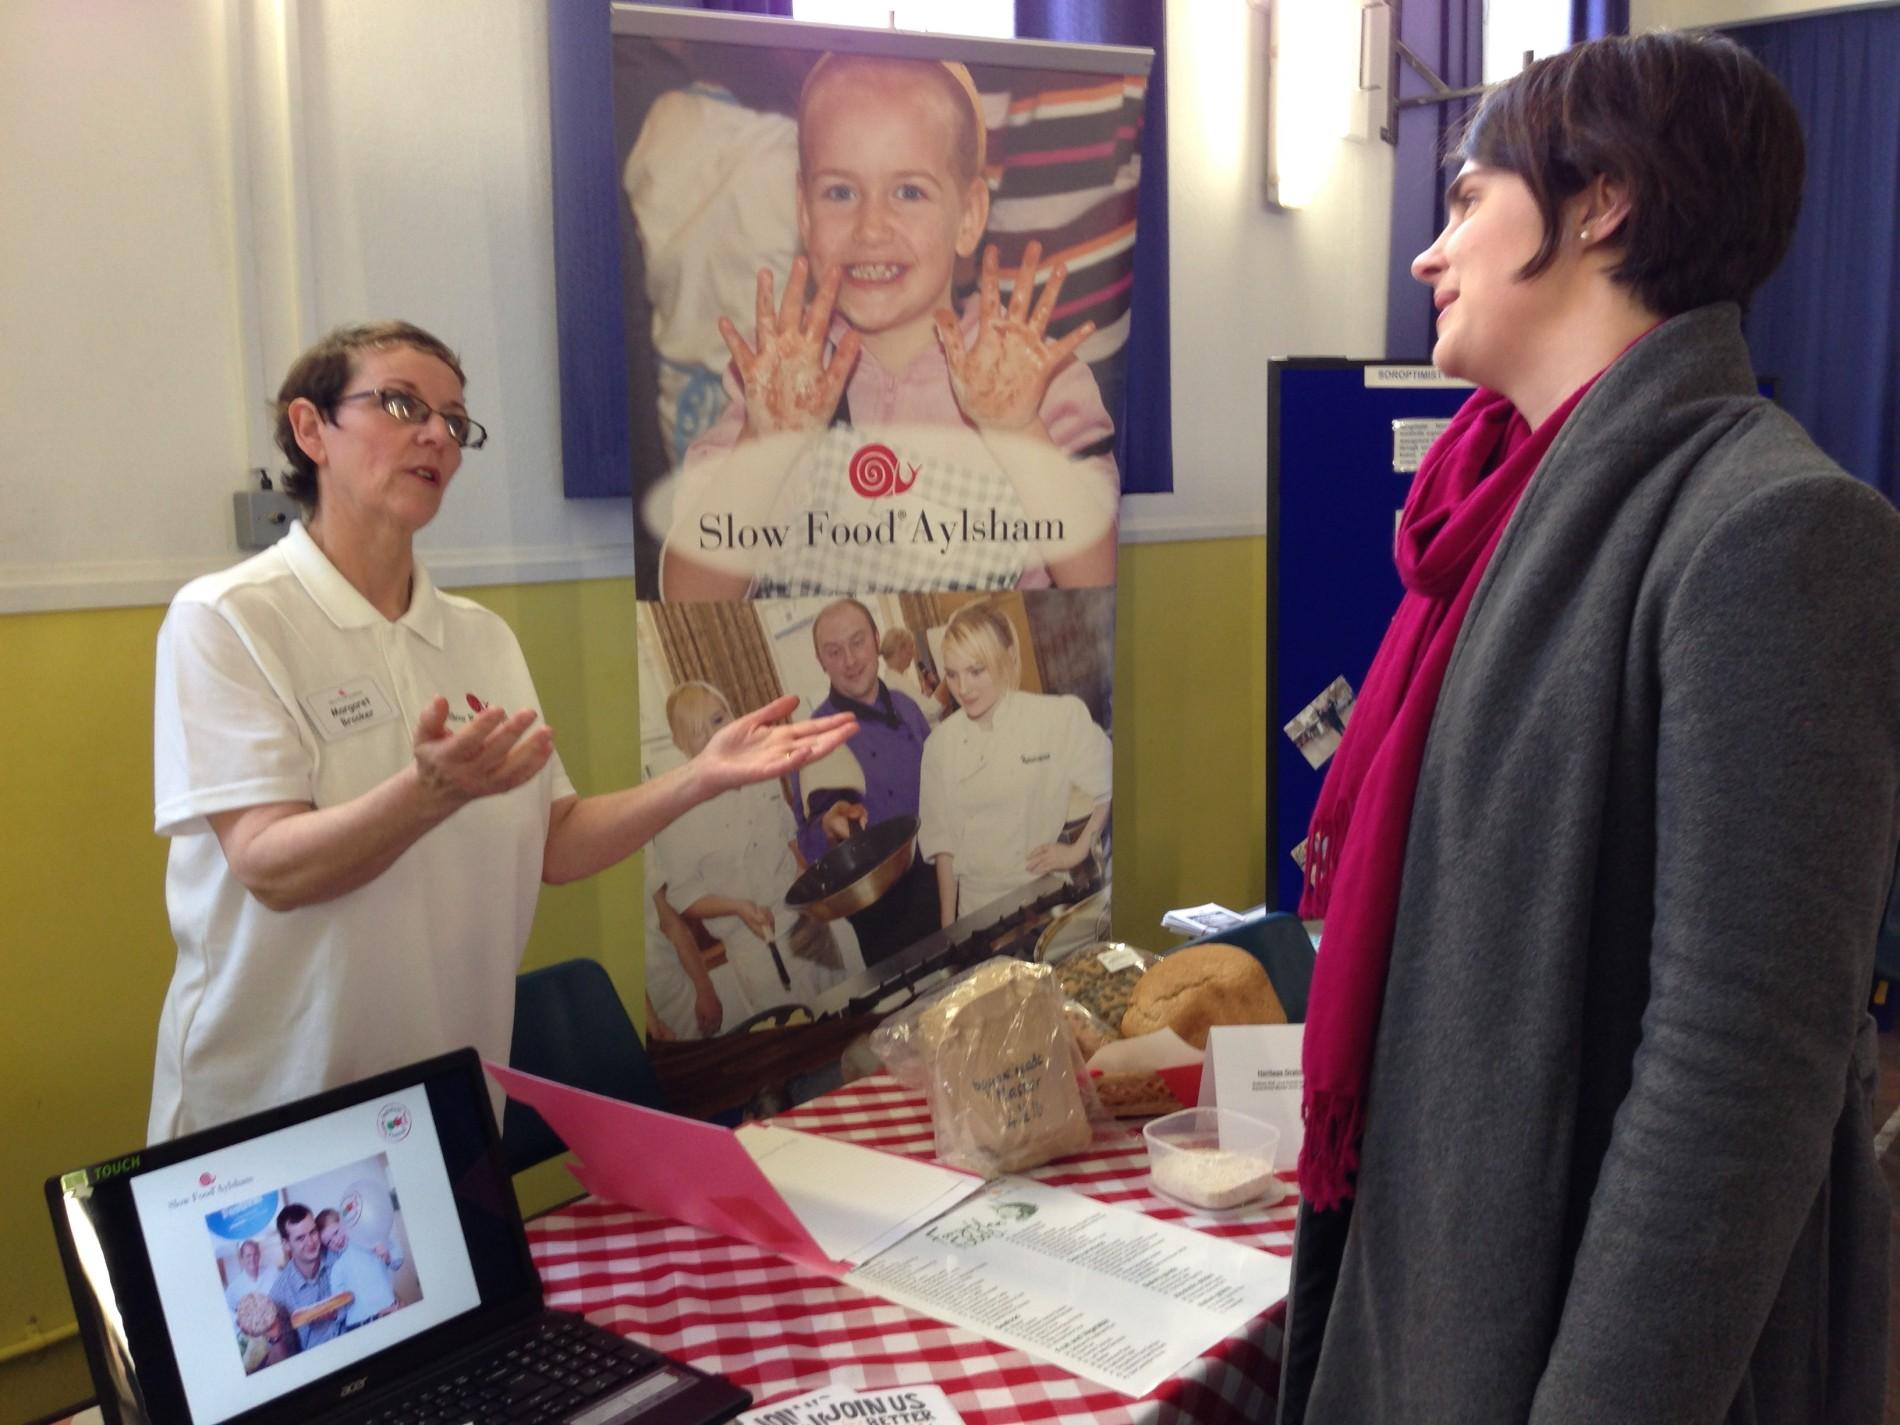 Slow Food Aylsham helps celebrate International Women's Day